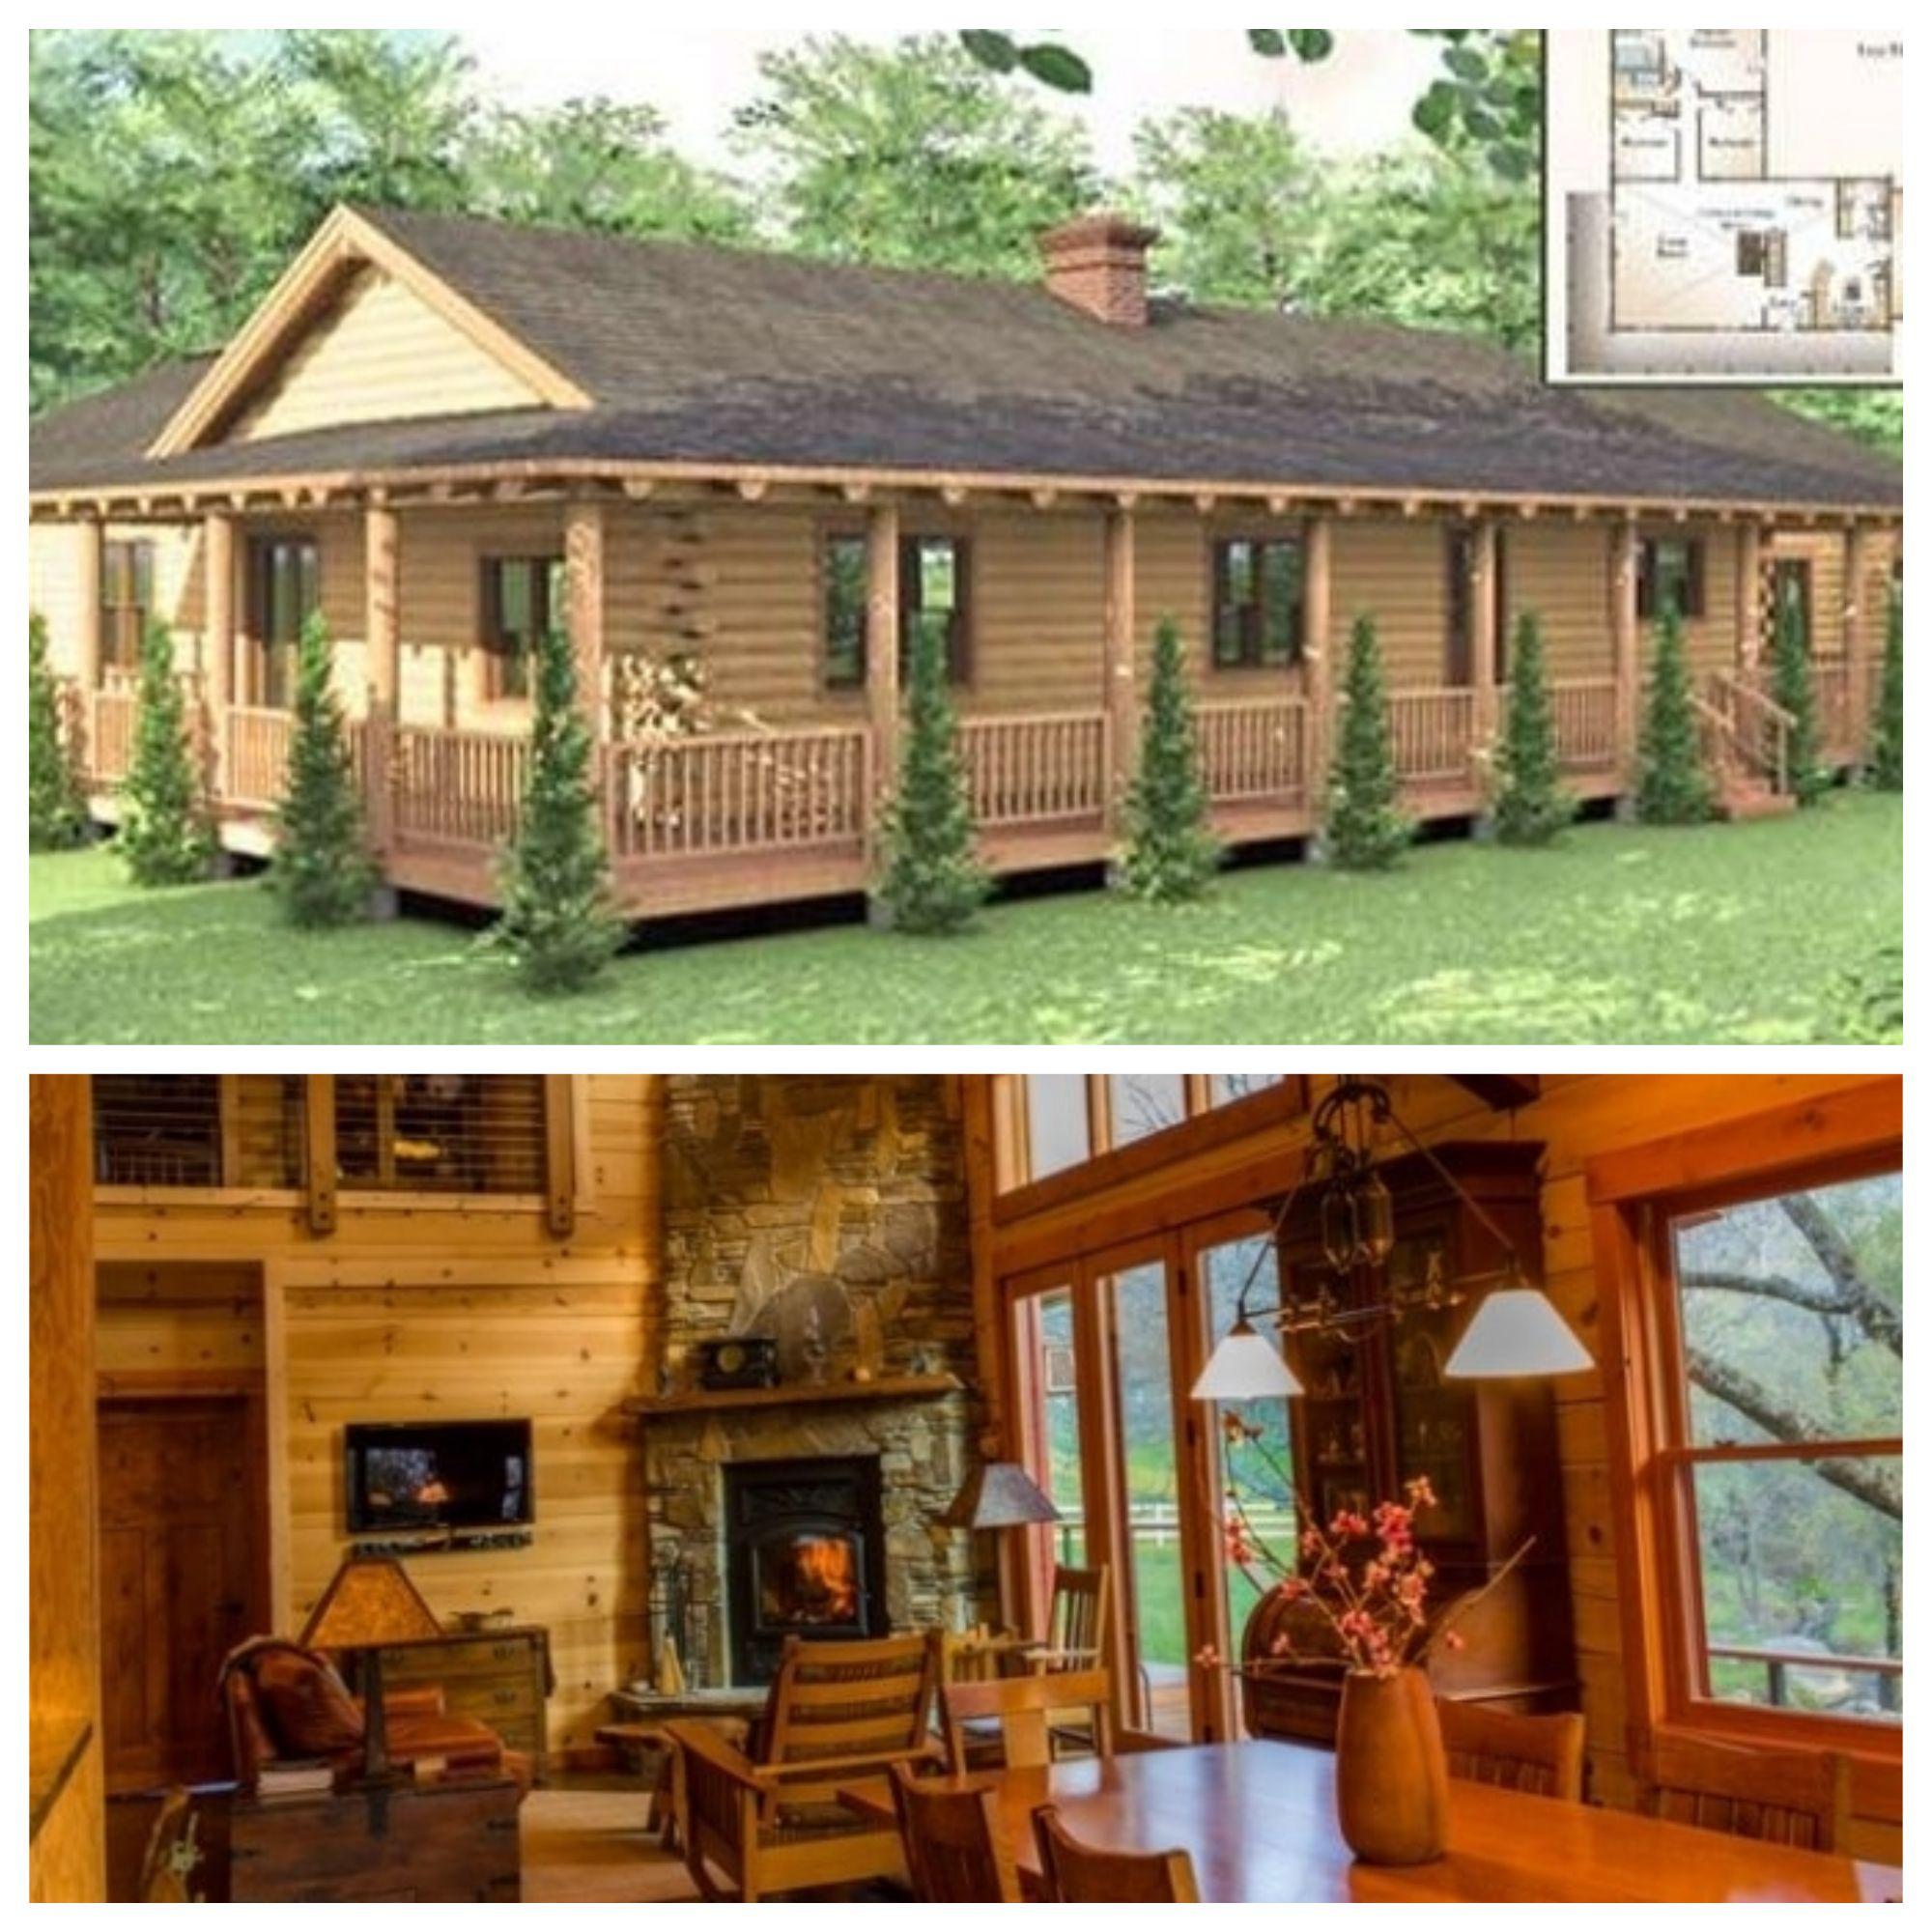 One Story Log House With Wrap Around Porch   Log homes, Log cabin exterior,  House